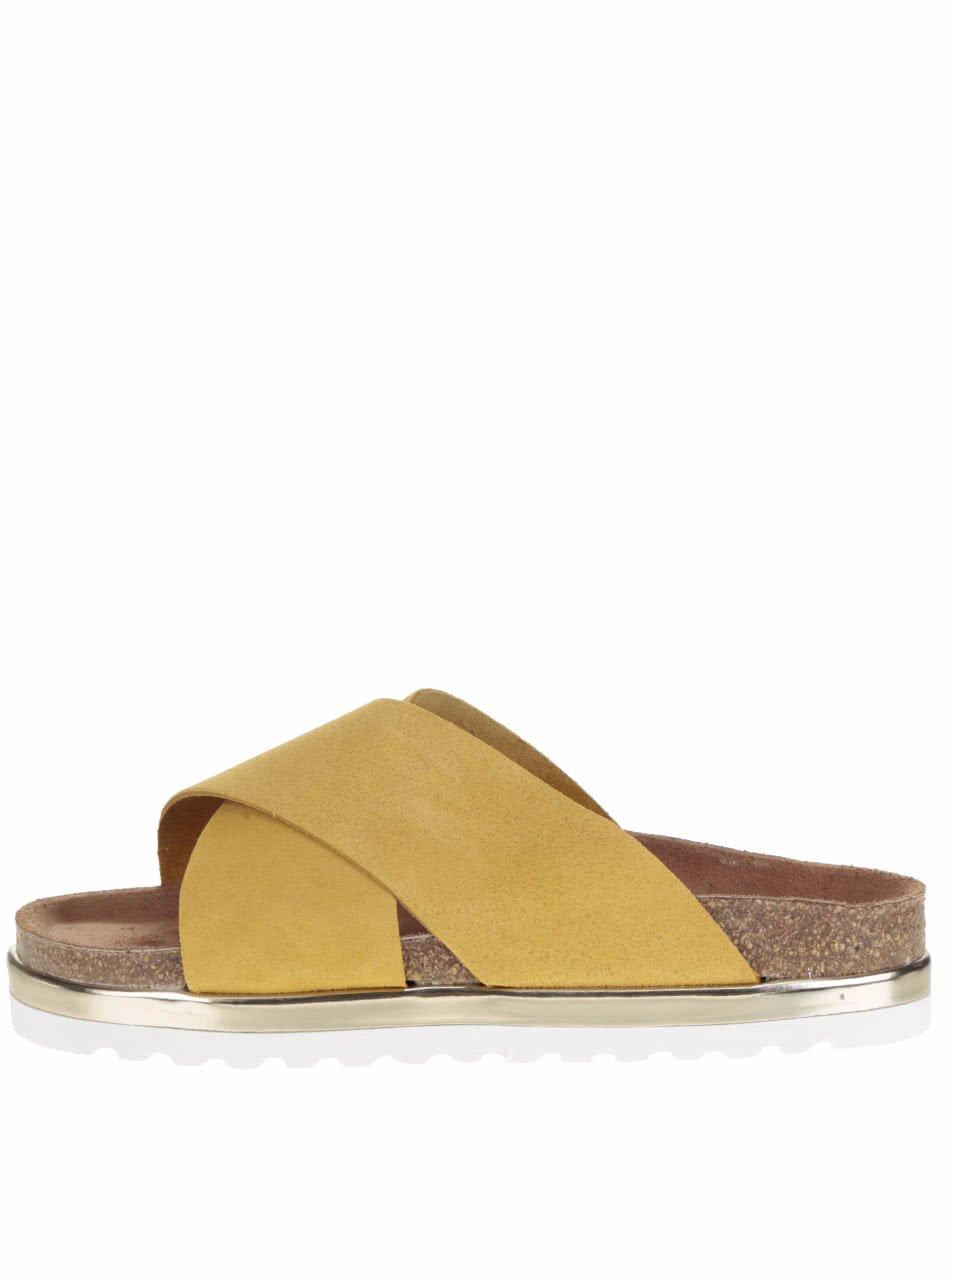 Žluté kožené pantofle na platformě VERO MODA Lise